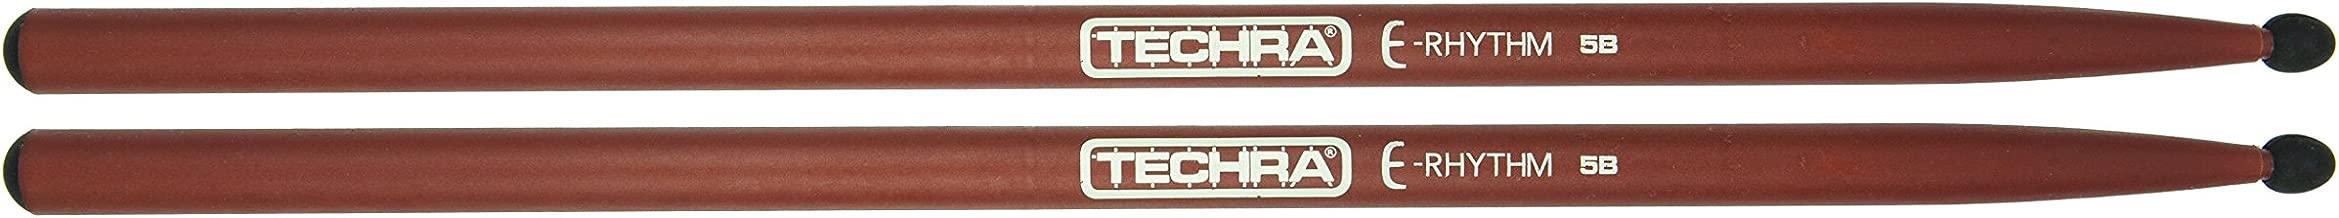 TECHRA E-RHYTHM 5B ドラムスティック